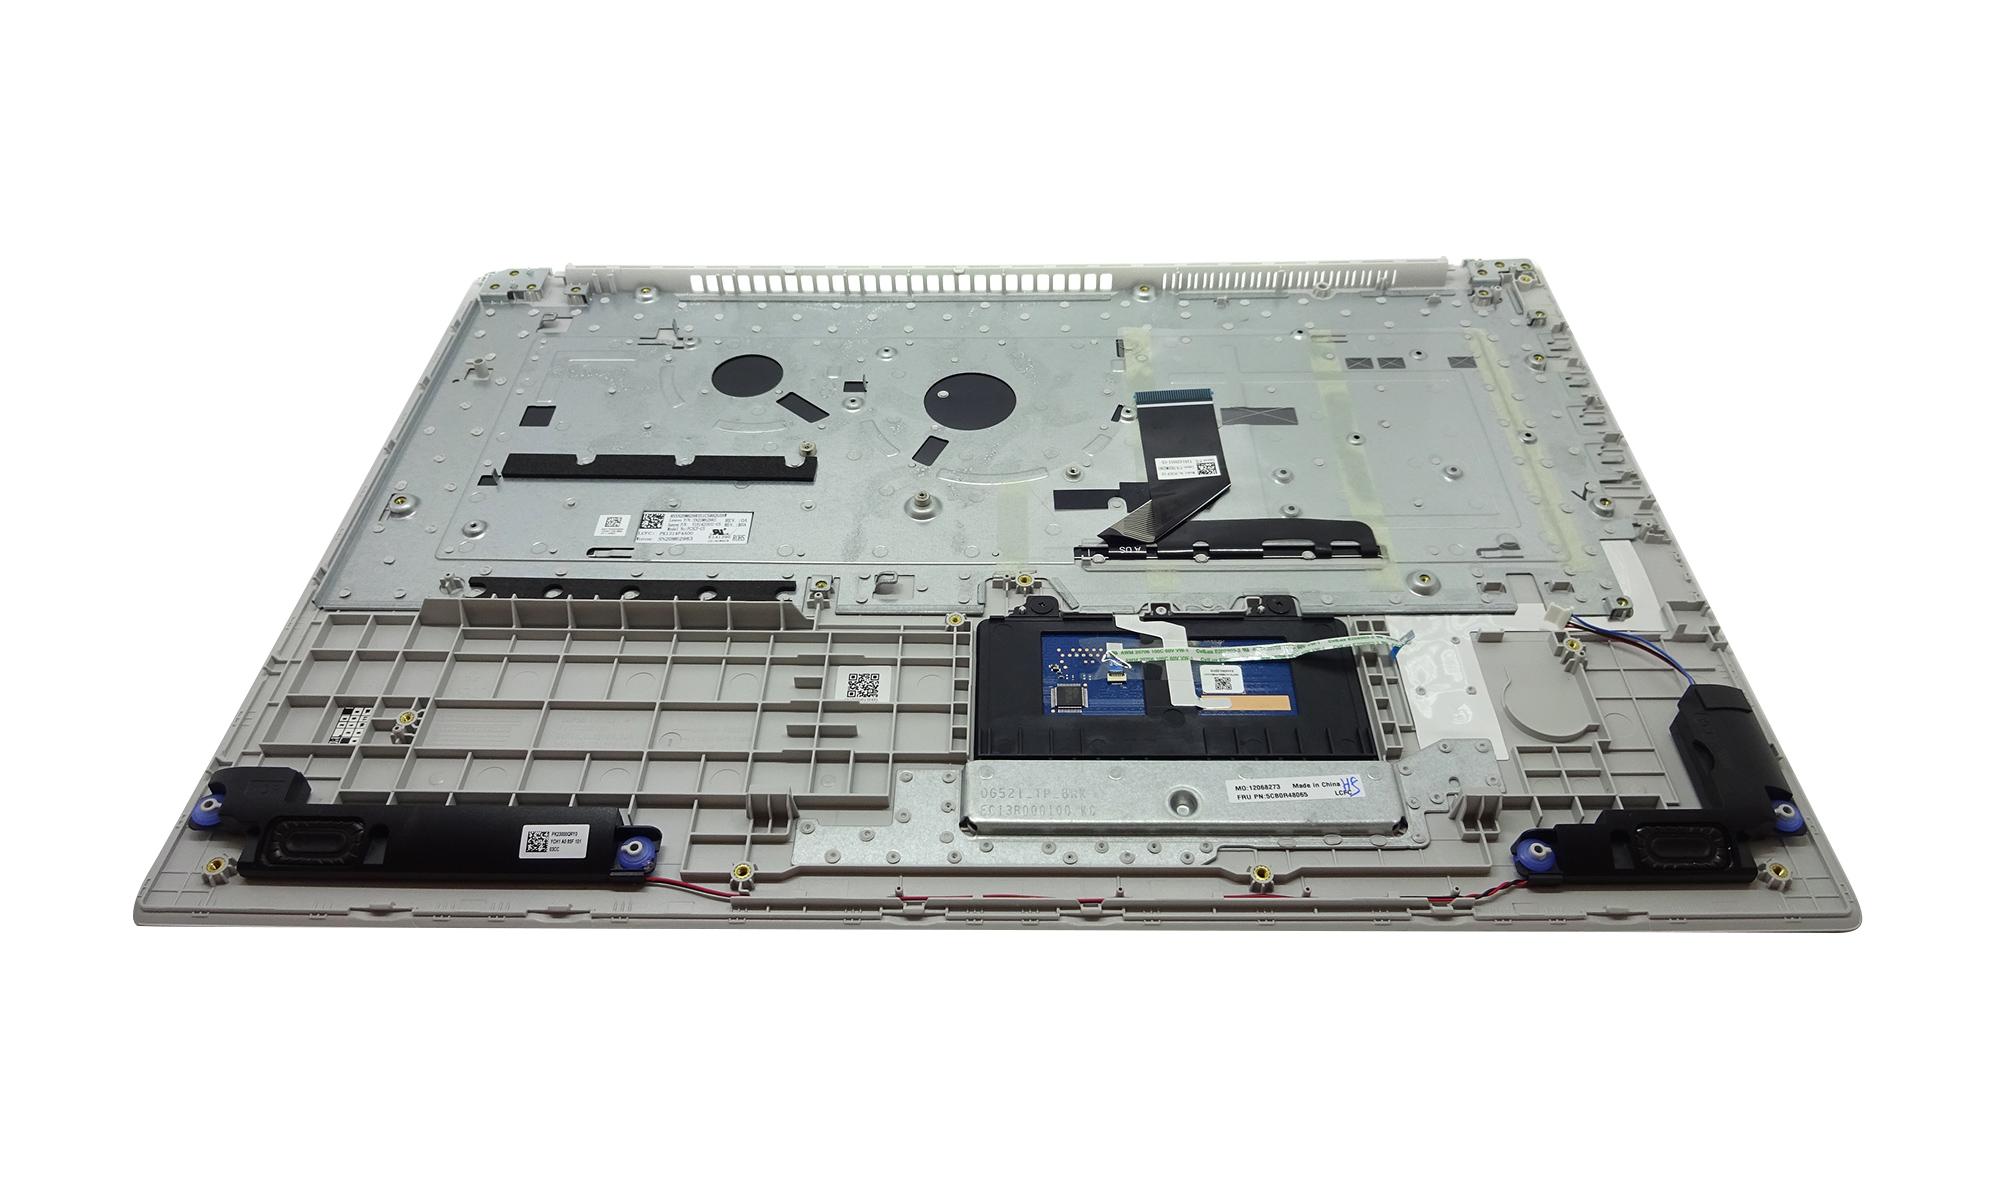 Carcasa superioara cu tastatura Lenovo IdeaPad 330-17ICH, argintiu, layout US, originala, model 5CB0R48065